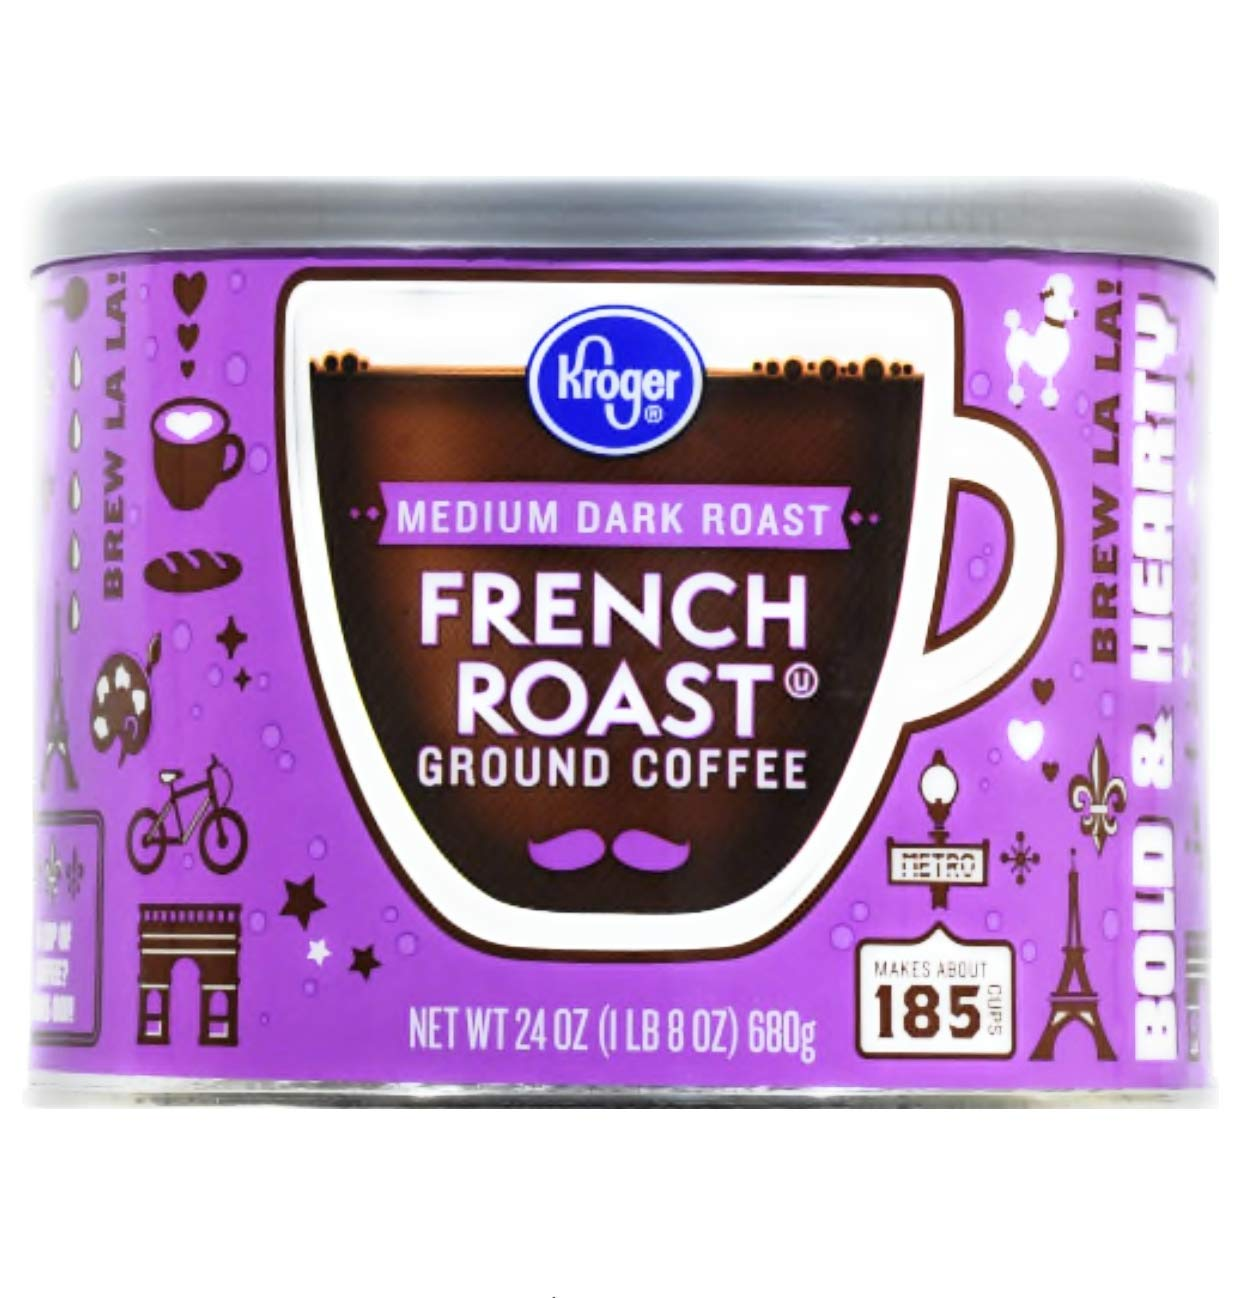 Kroger French Roast Medium Dark Roast Ground Coffe 24 oz